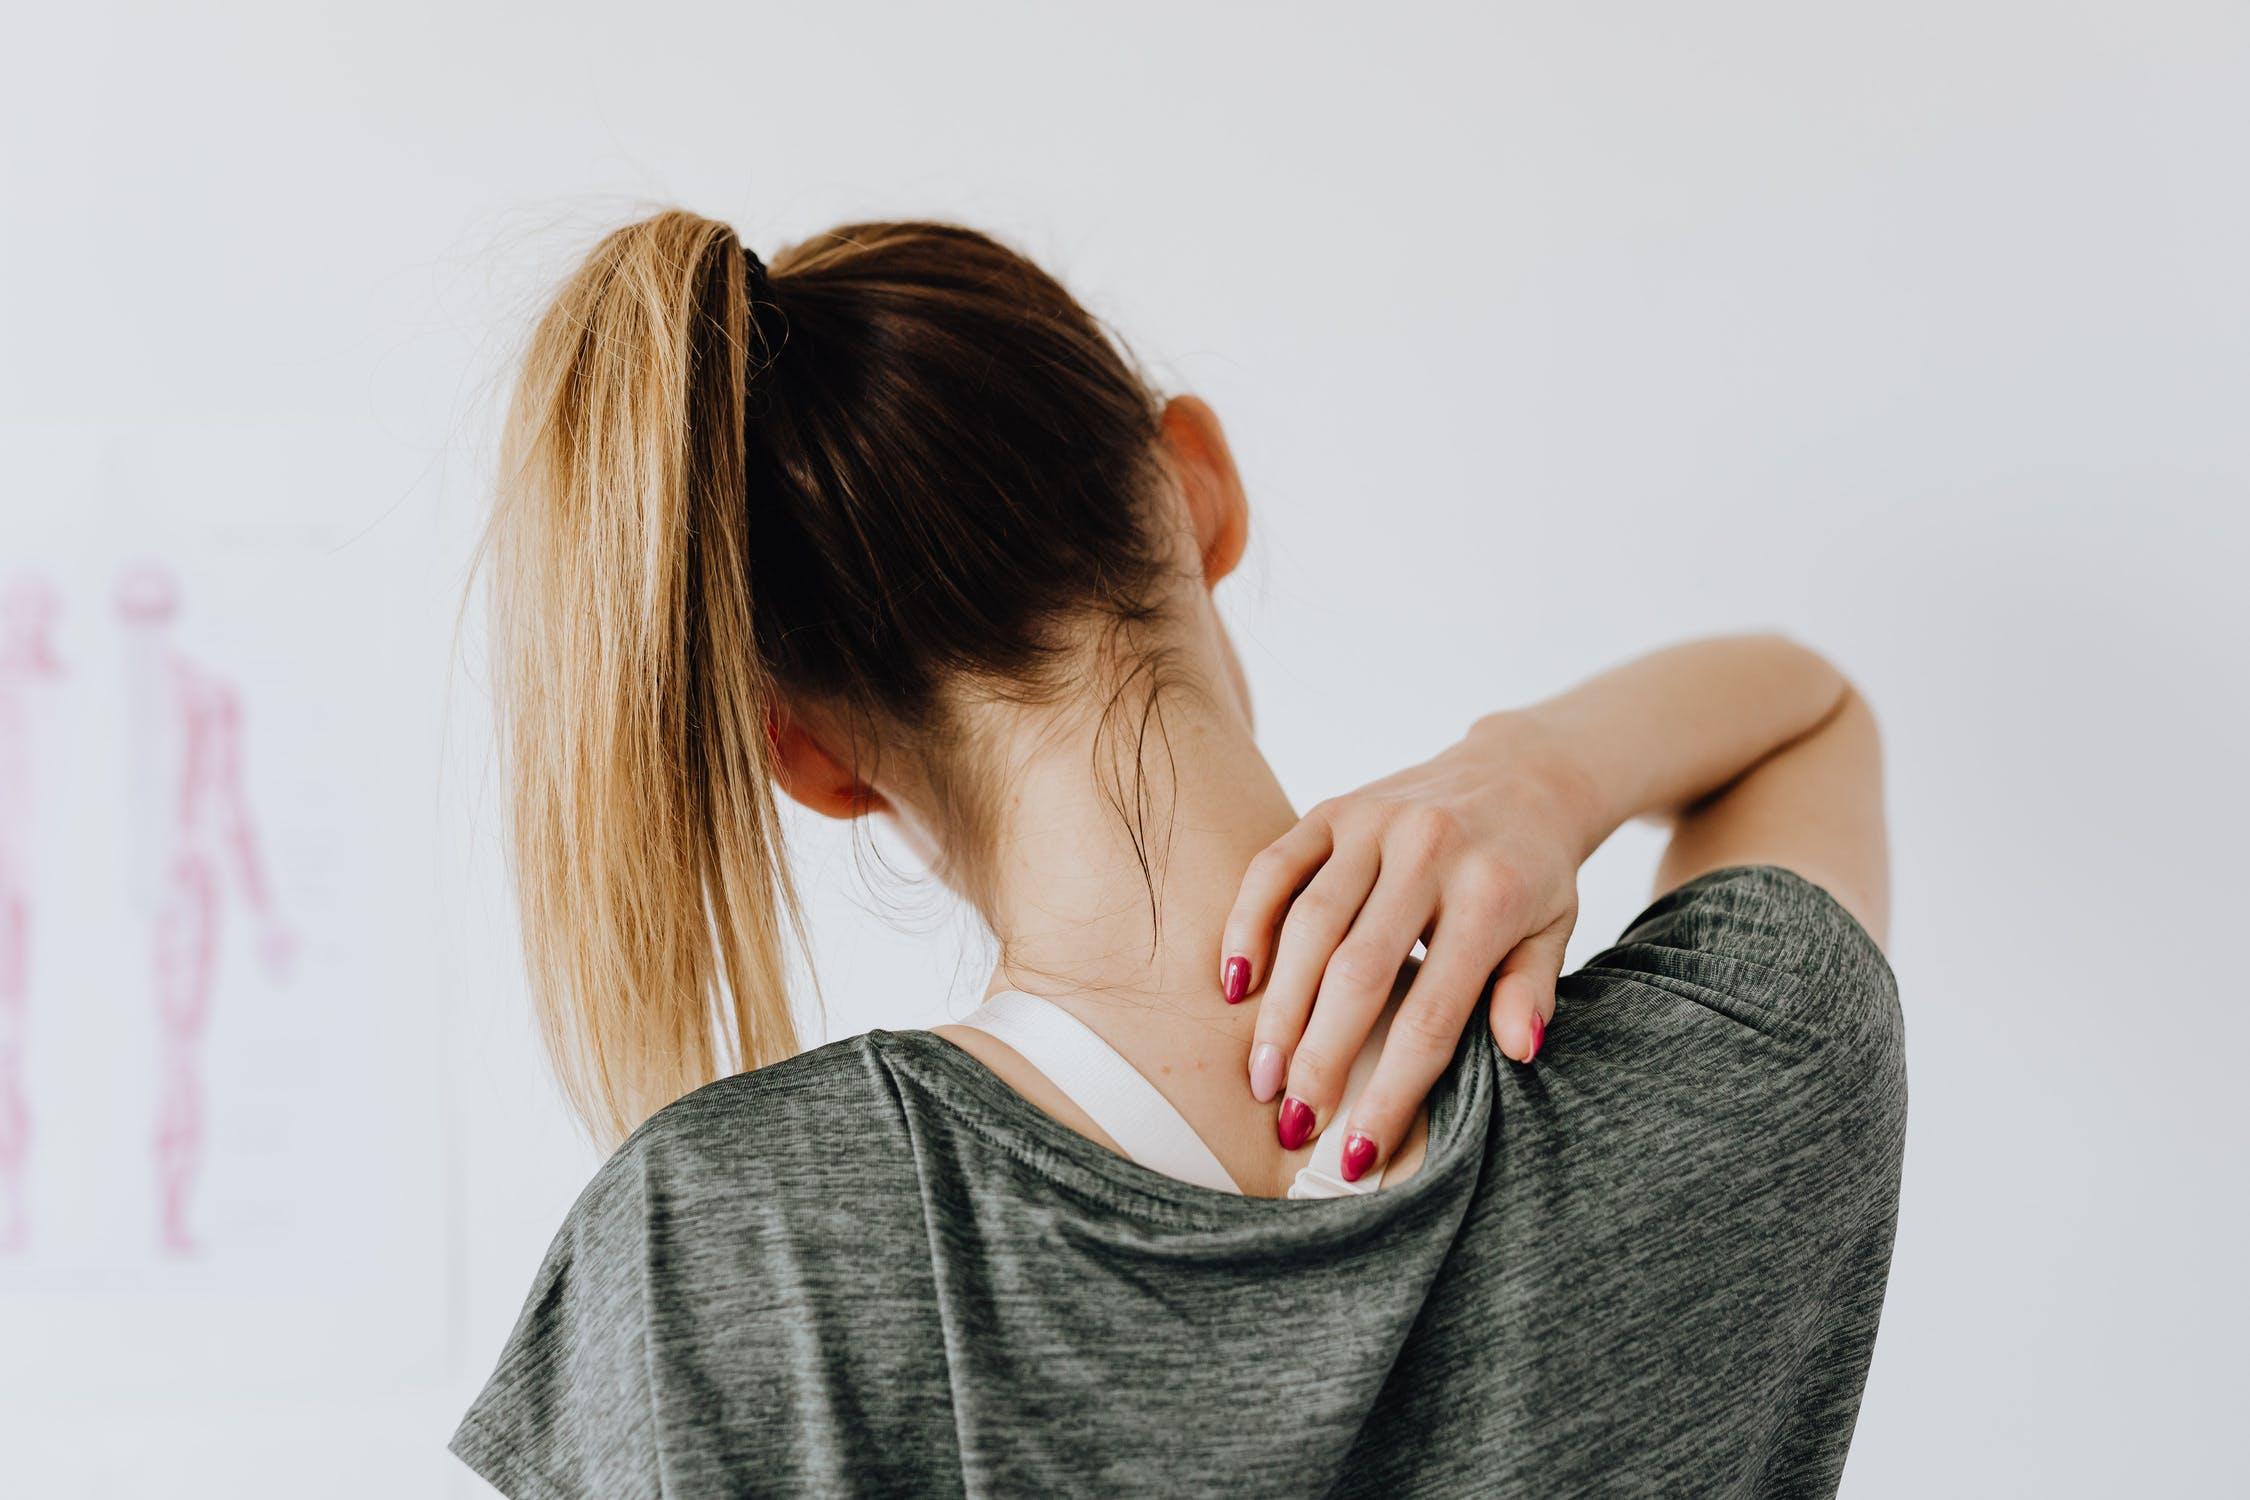 Zervikale Radikulopathie (eingeklemmter Nerv)